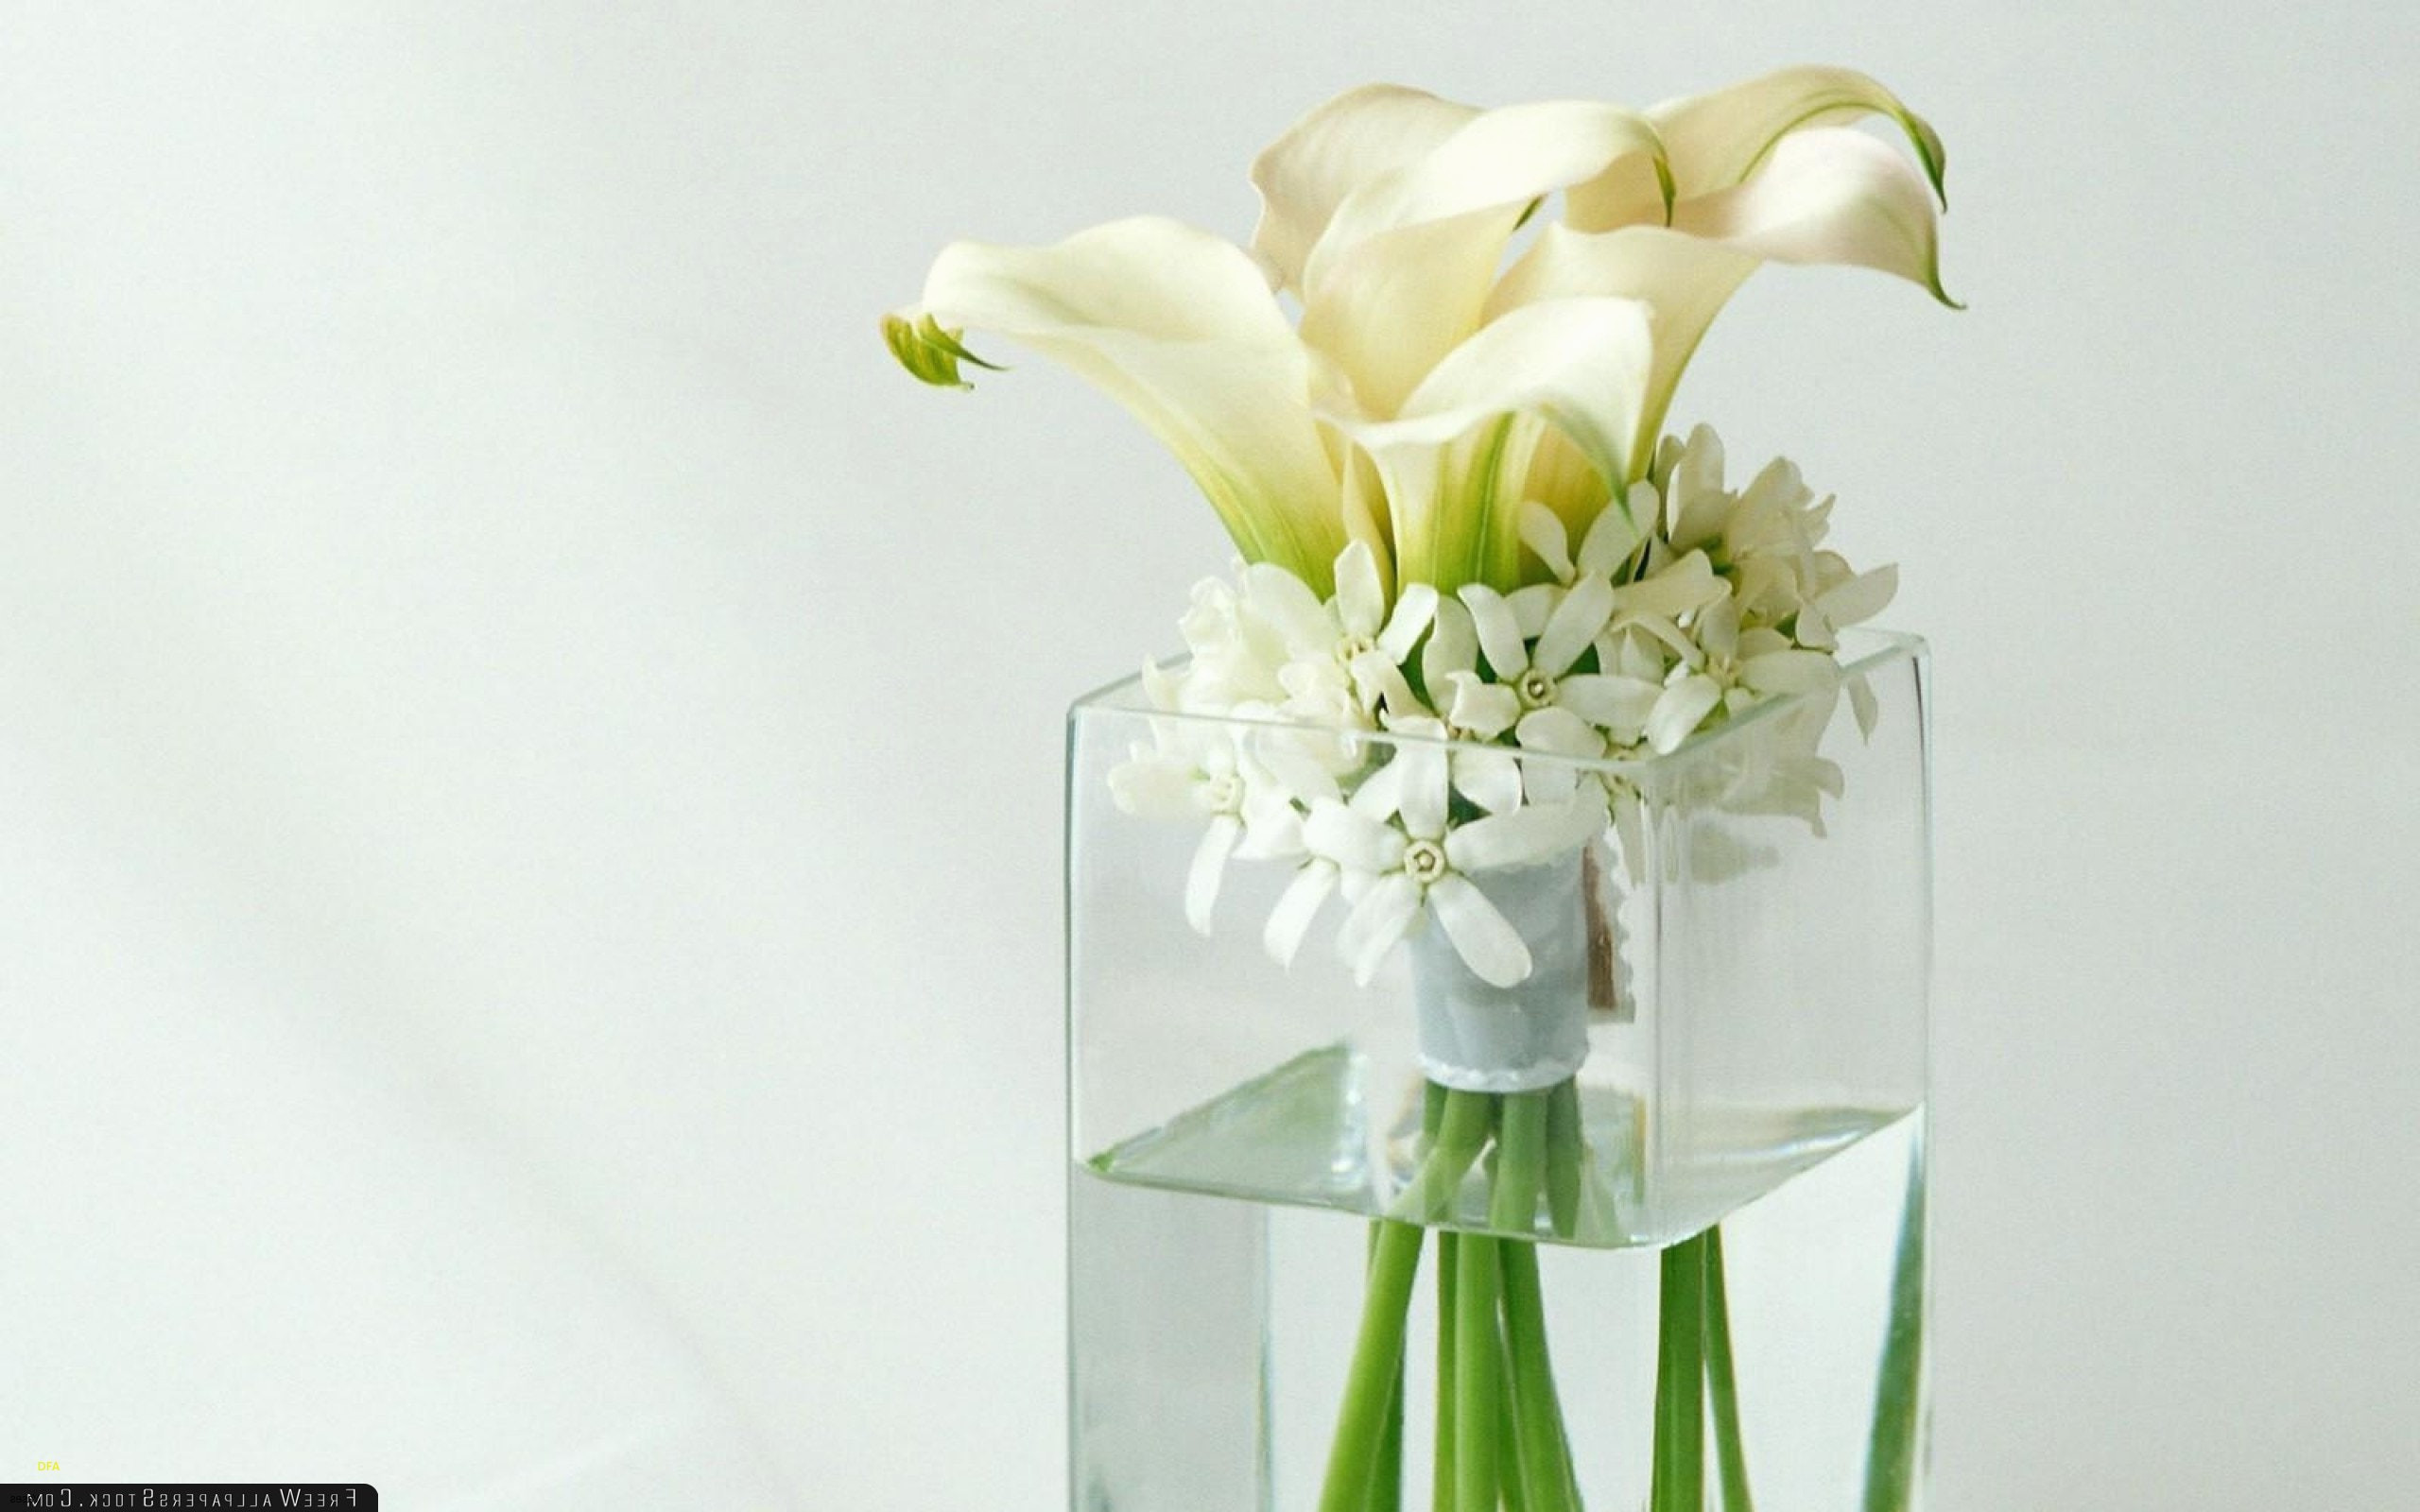 Galvanised Flower Vase Of Water Vases Centerpieces Photograph Fall Season Decoration Elegant Pertaining to Fall Season Decoration Elegant Tall Vase Centerpiece Ideas Vases